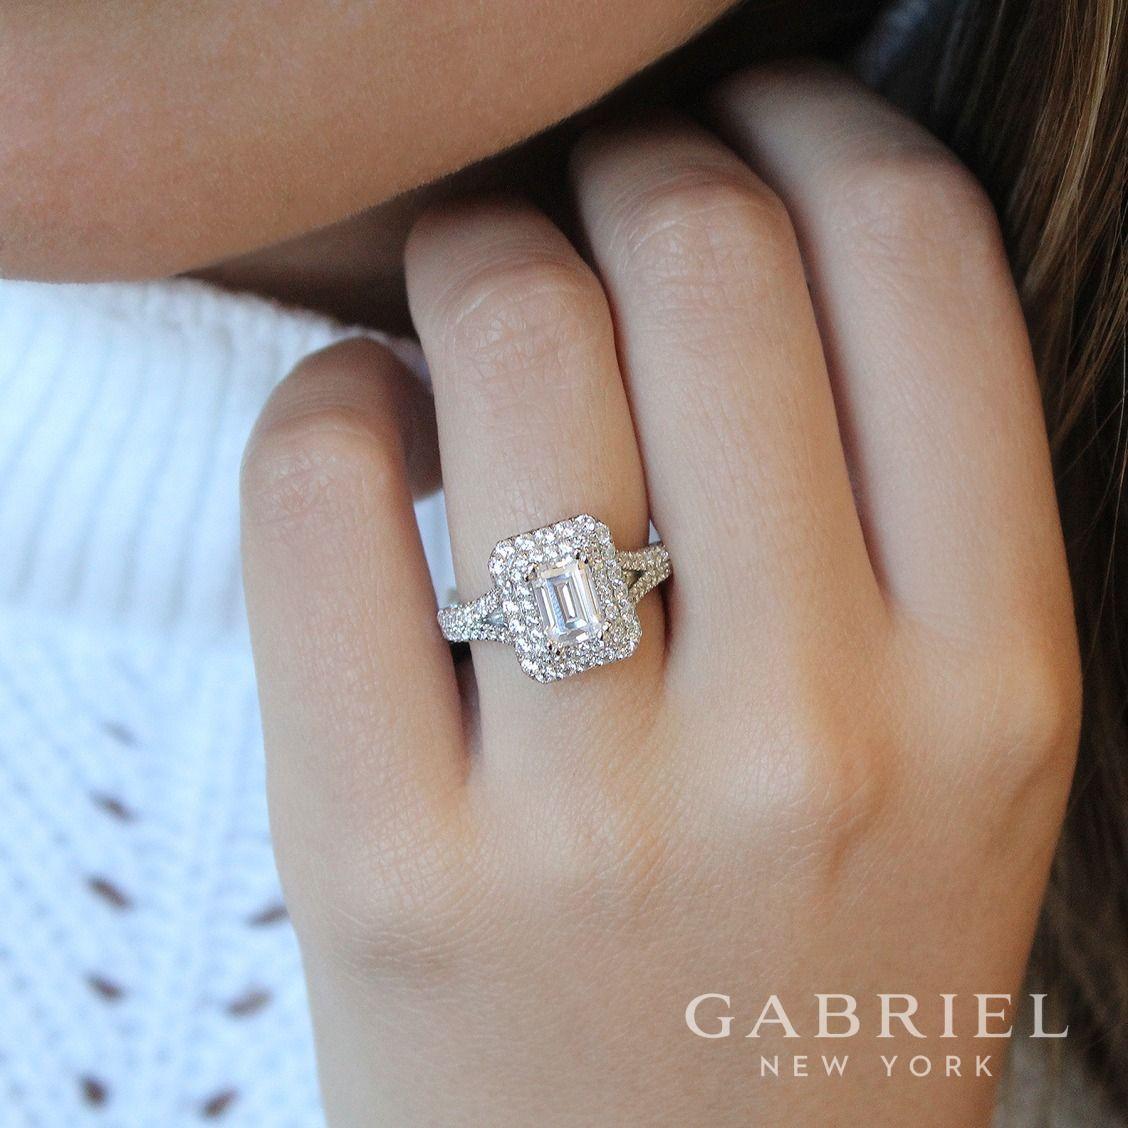 Gabriel   Co.-Voted  1 Most Preferred Fine Jewelry and Bridal Brand ... 52936752c6